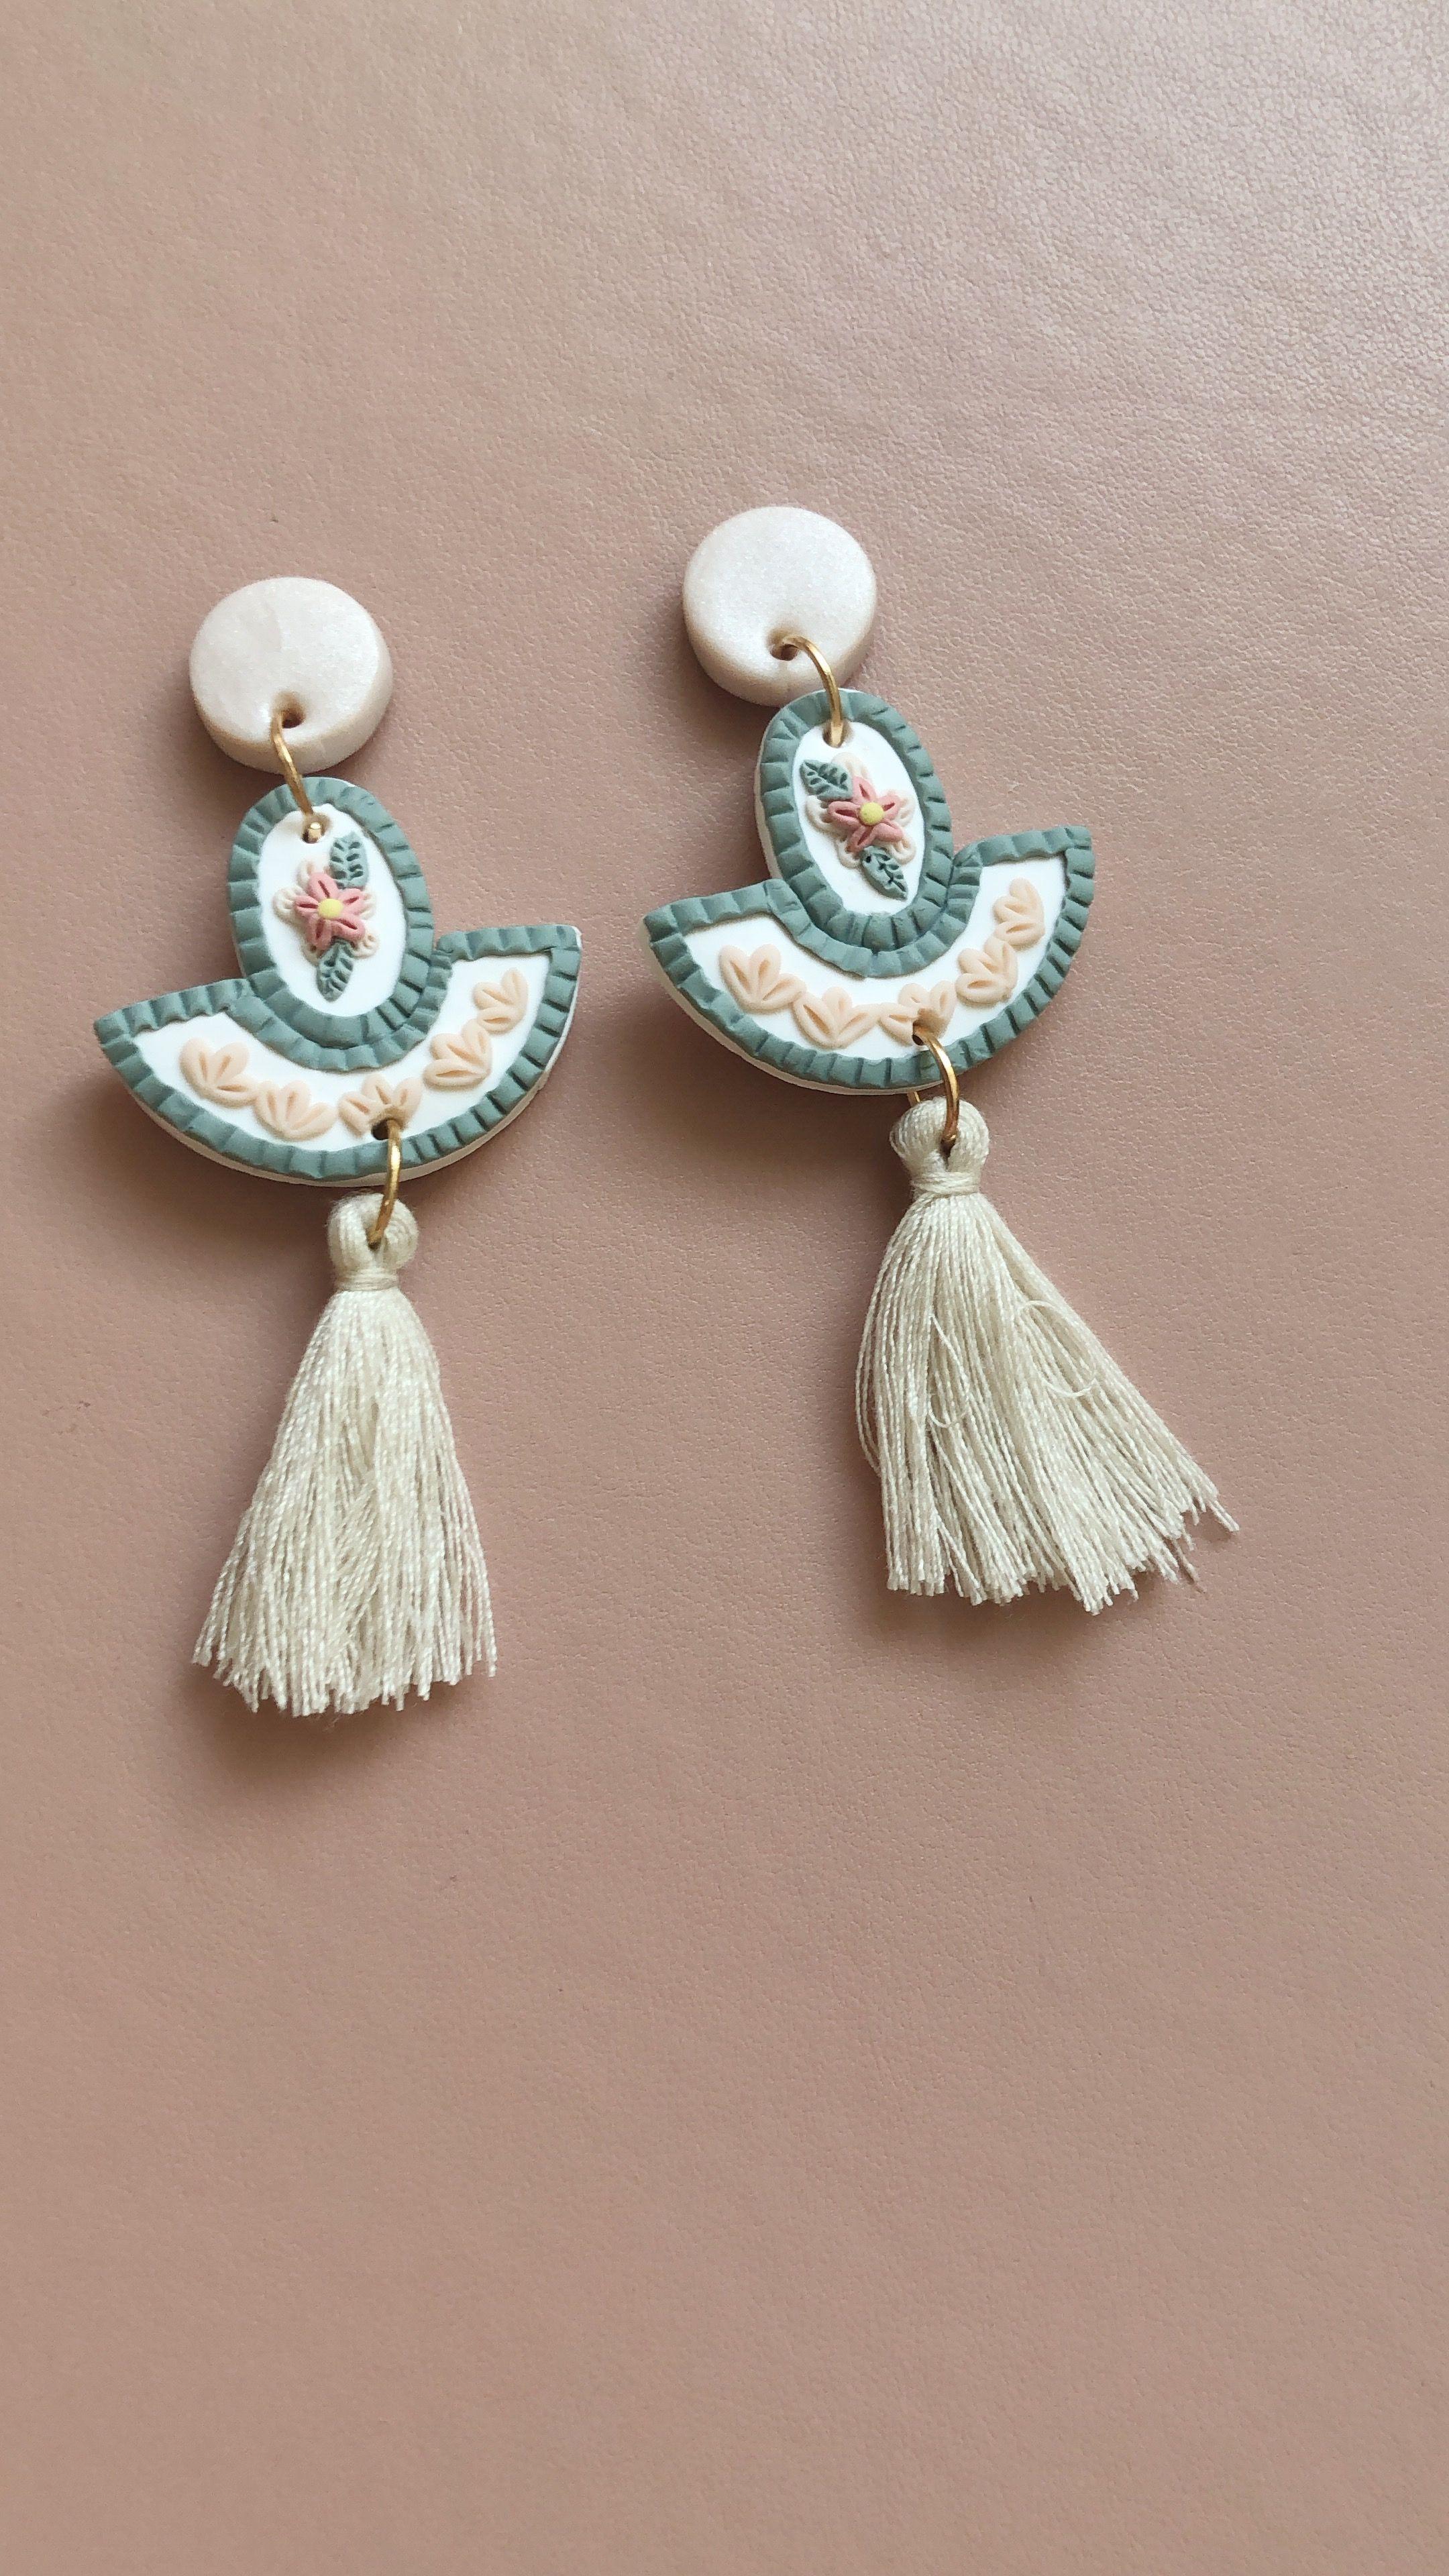 Memphis style Sterling silver chandelier earrings 3 Pairs of 1980s ear hanger vintage stud earrings in 925 Sterling